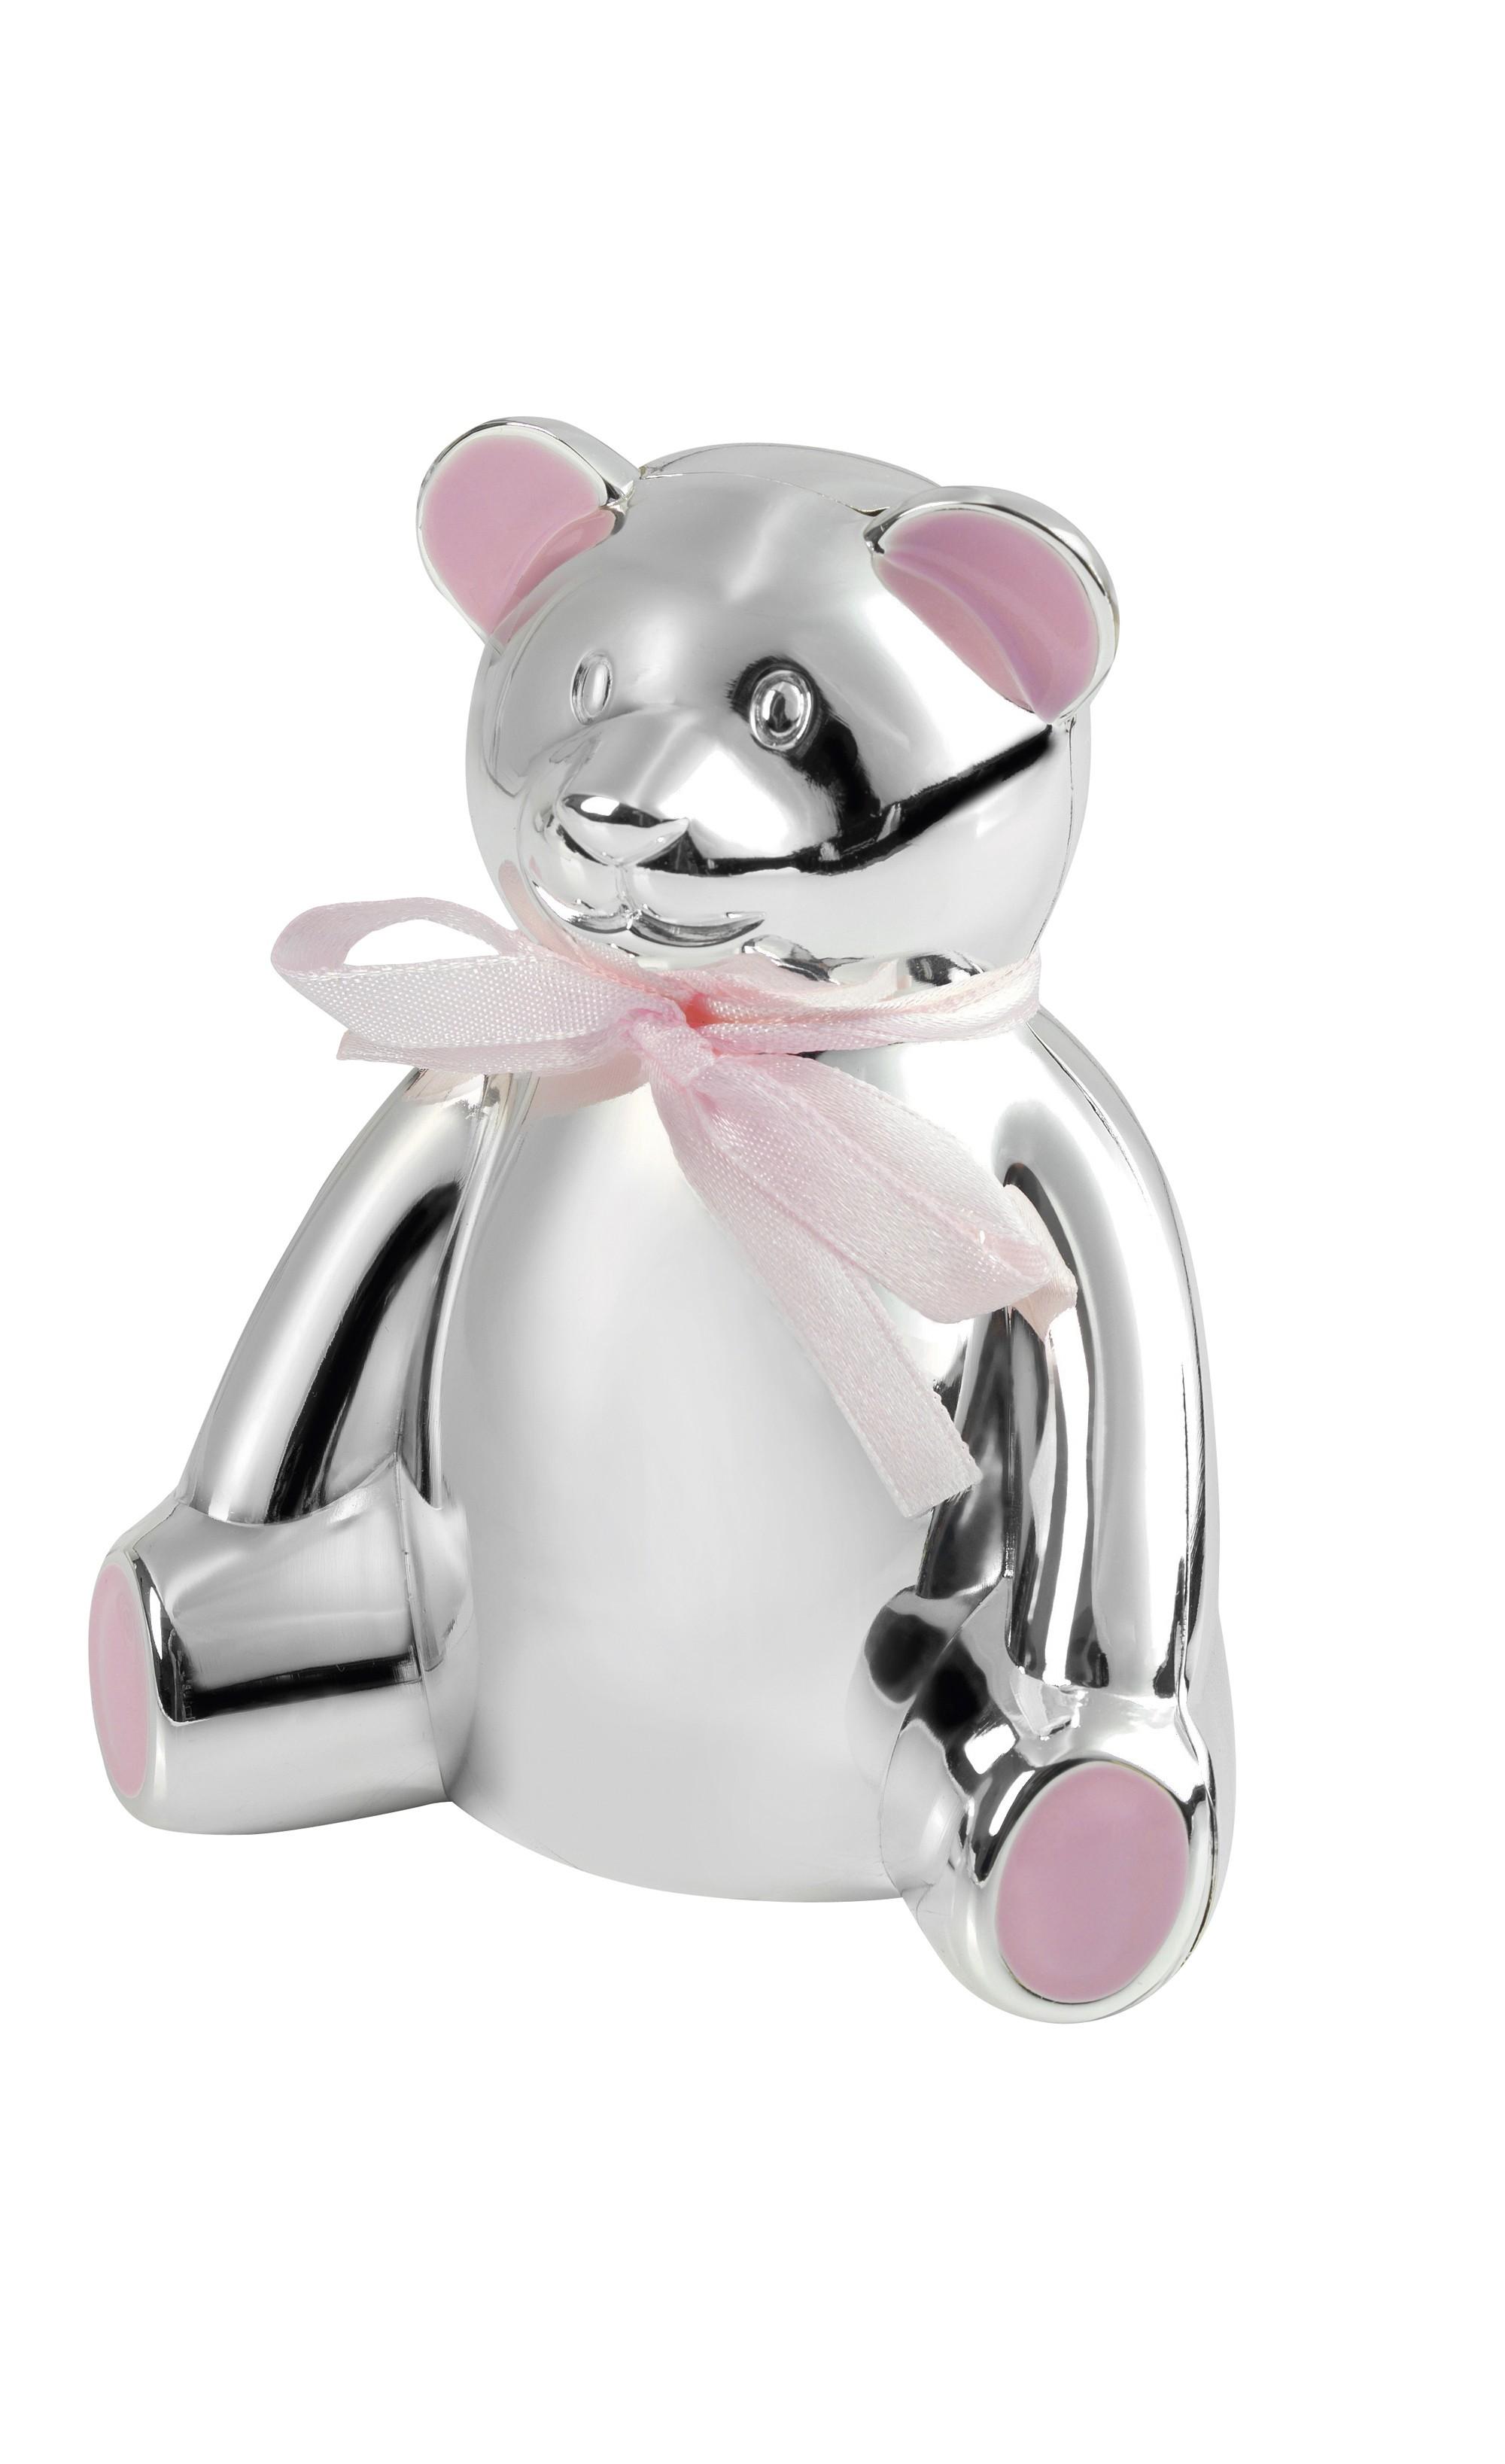 10cm Teddy Bear Money Box Pink Bow